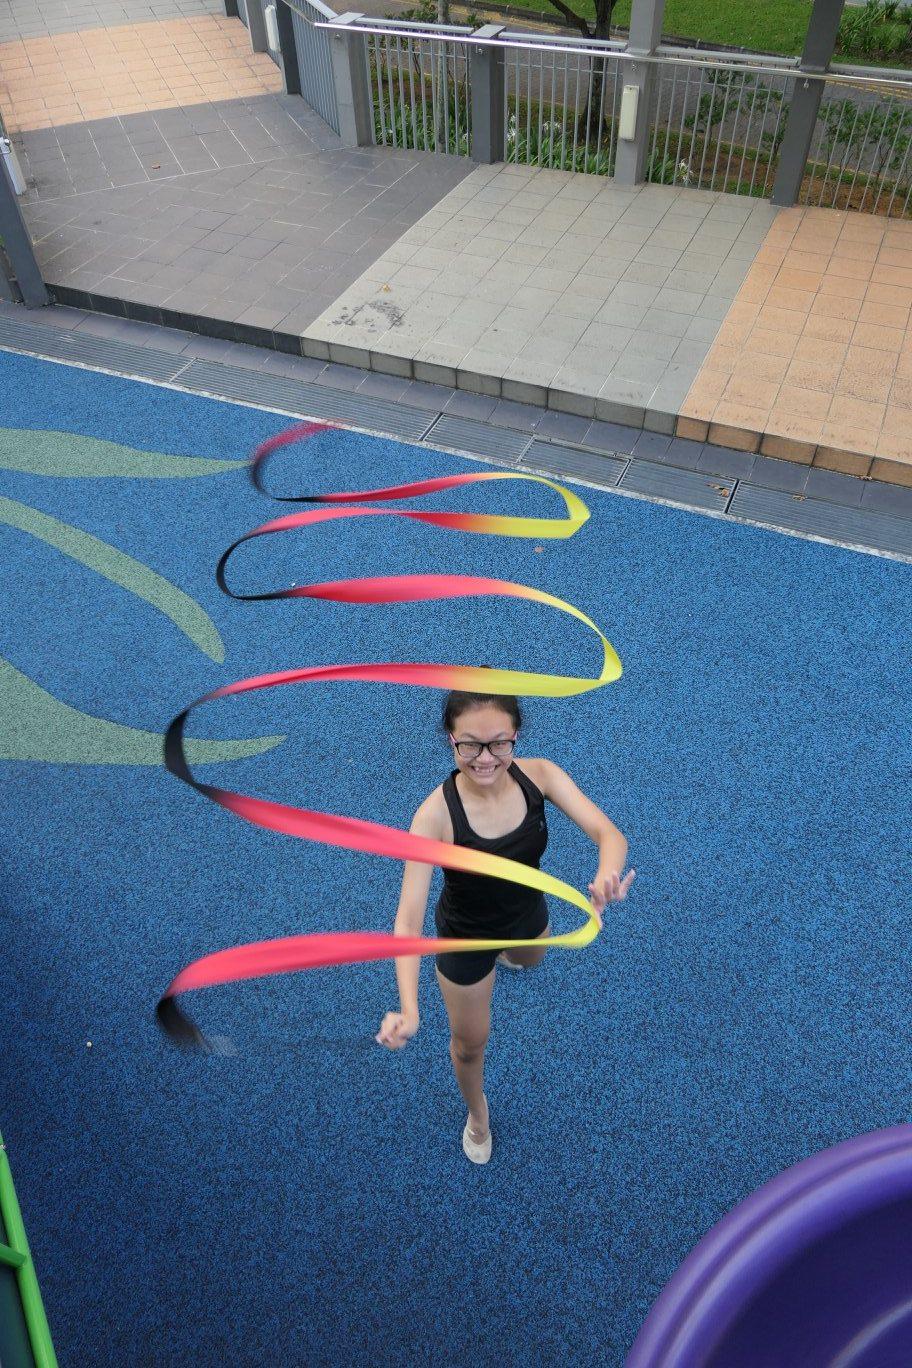 Singapore Rhythmic Gymnast Phoebe Lee